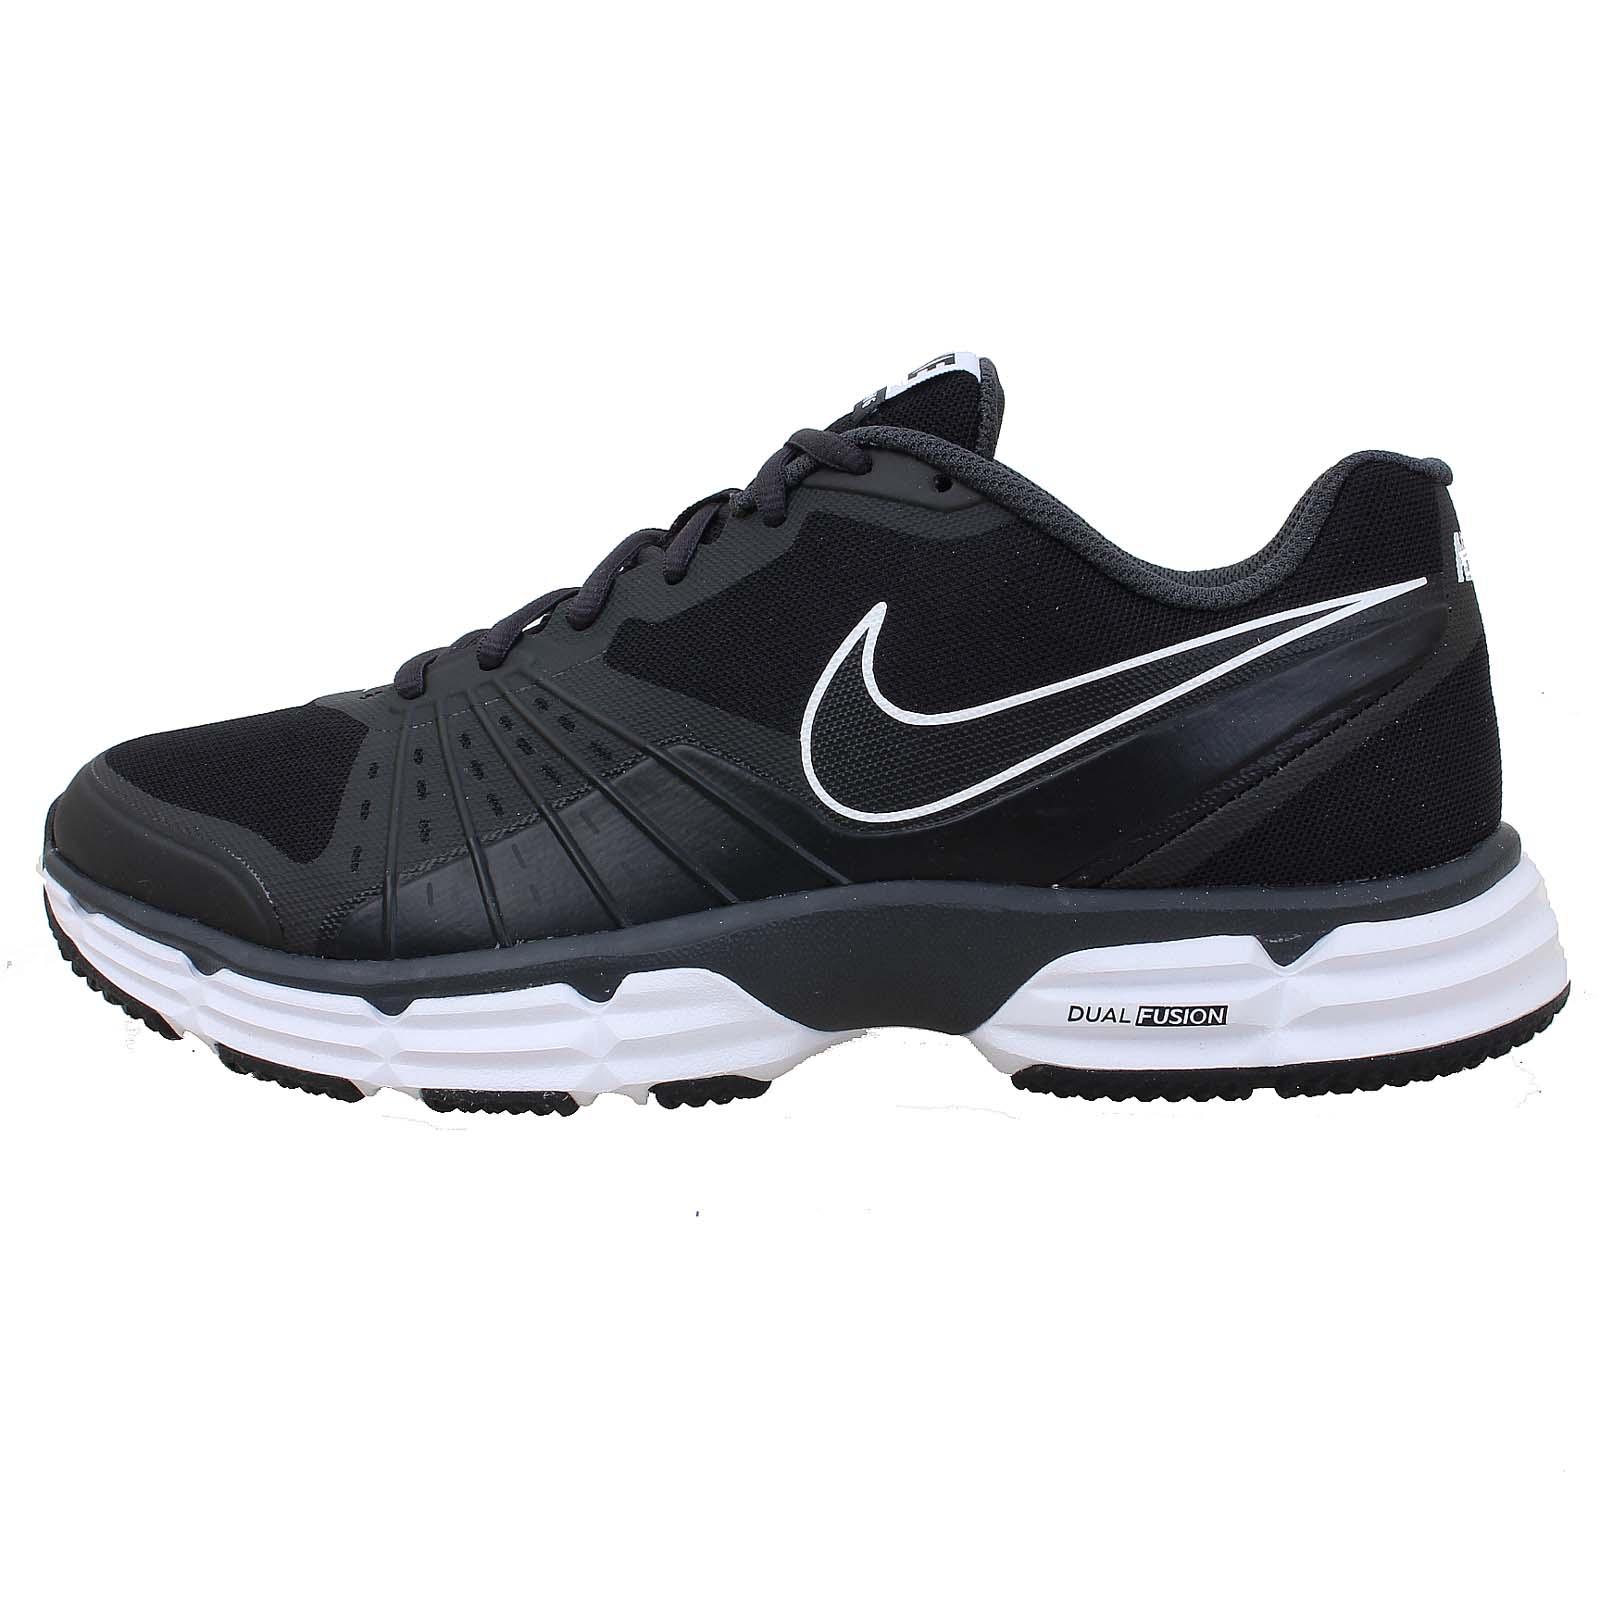 Nike Cross Training Shoes Amazon